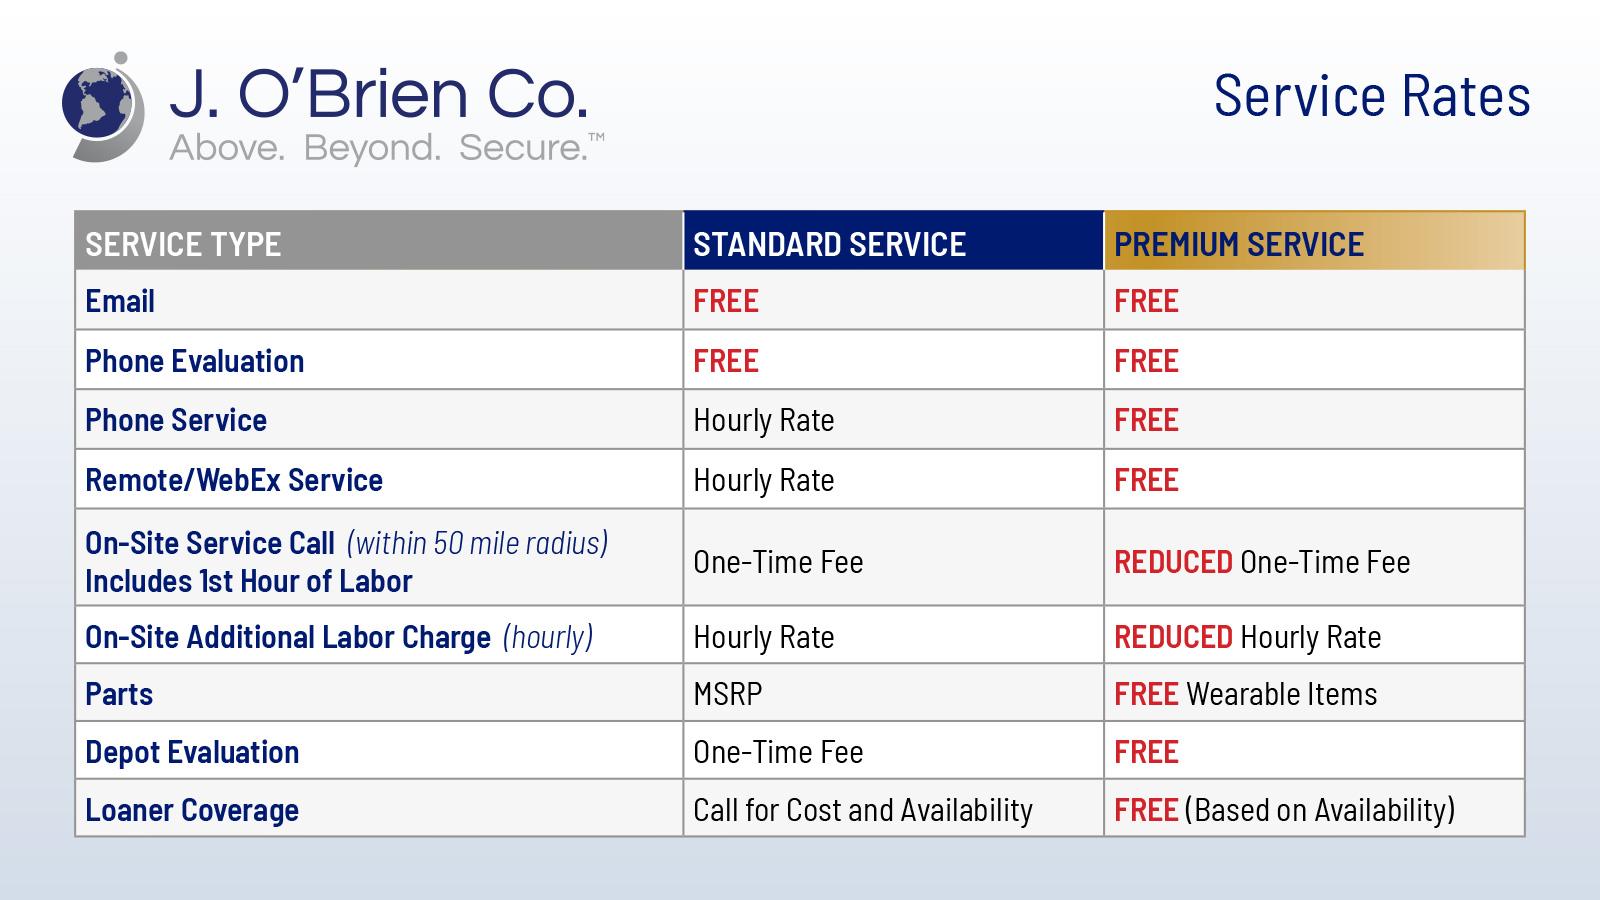 FARGO id card printer choose j. o'brien Service Rates